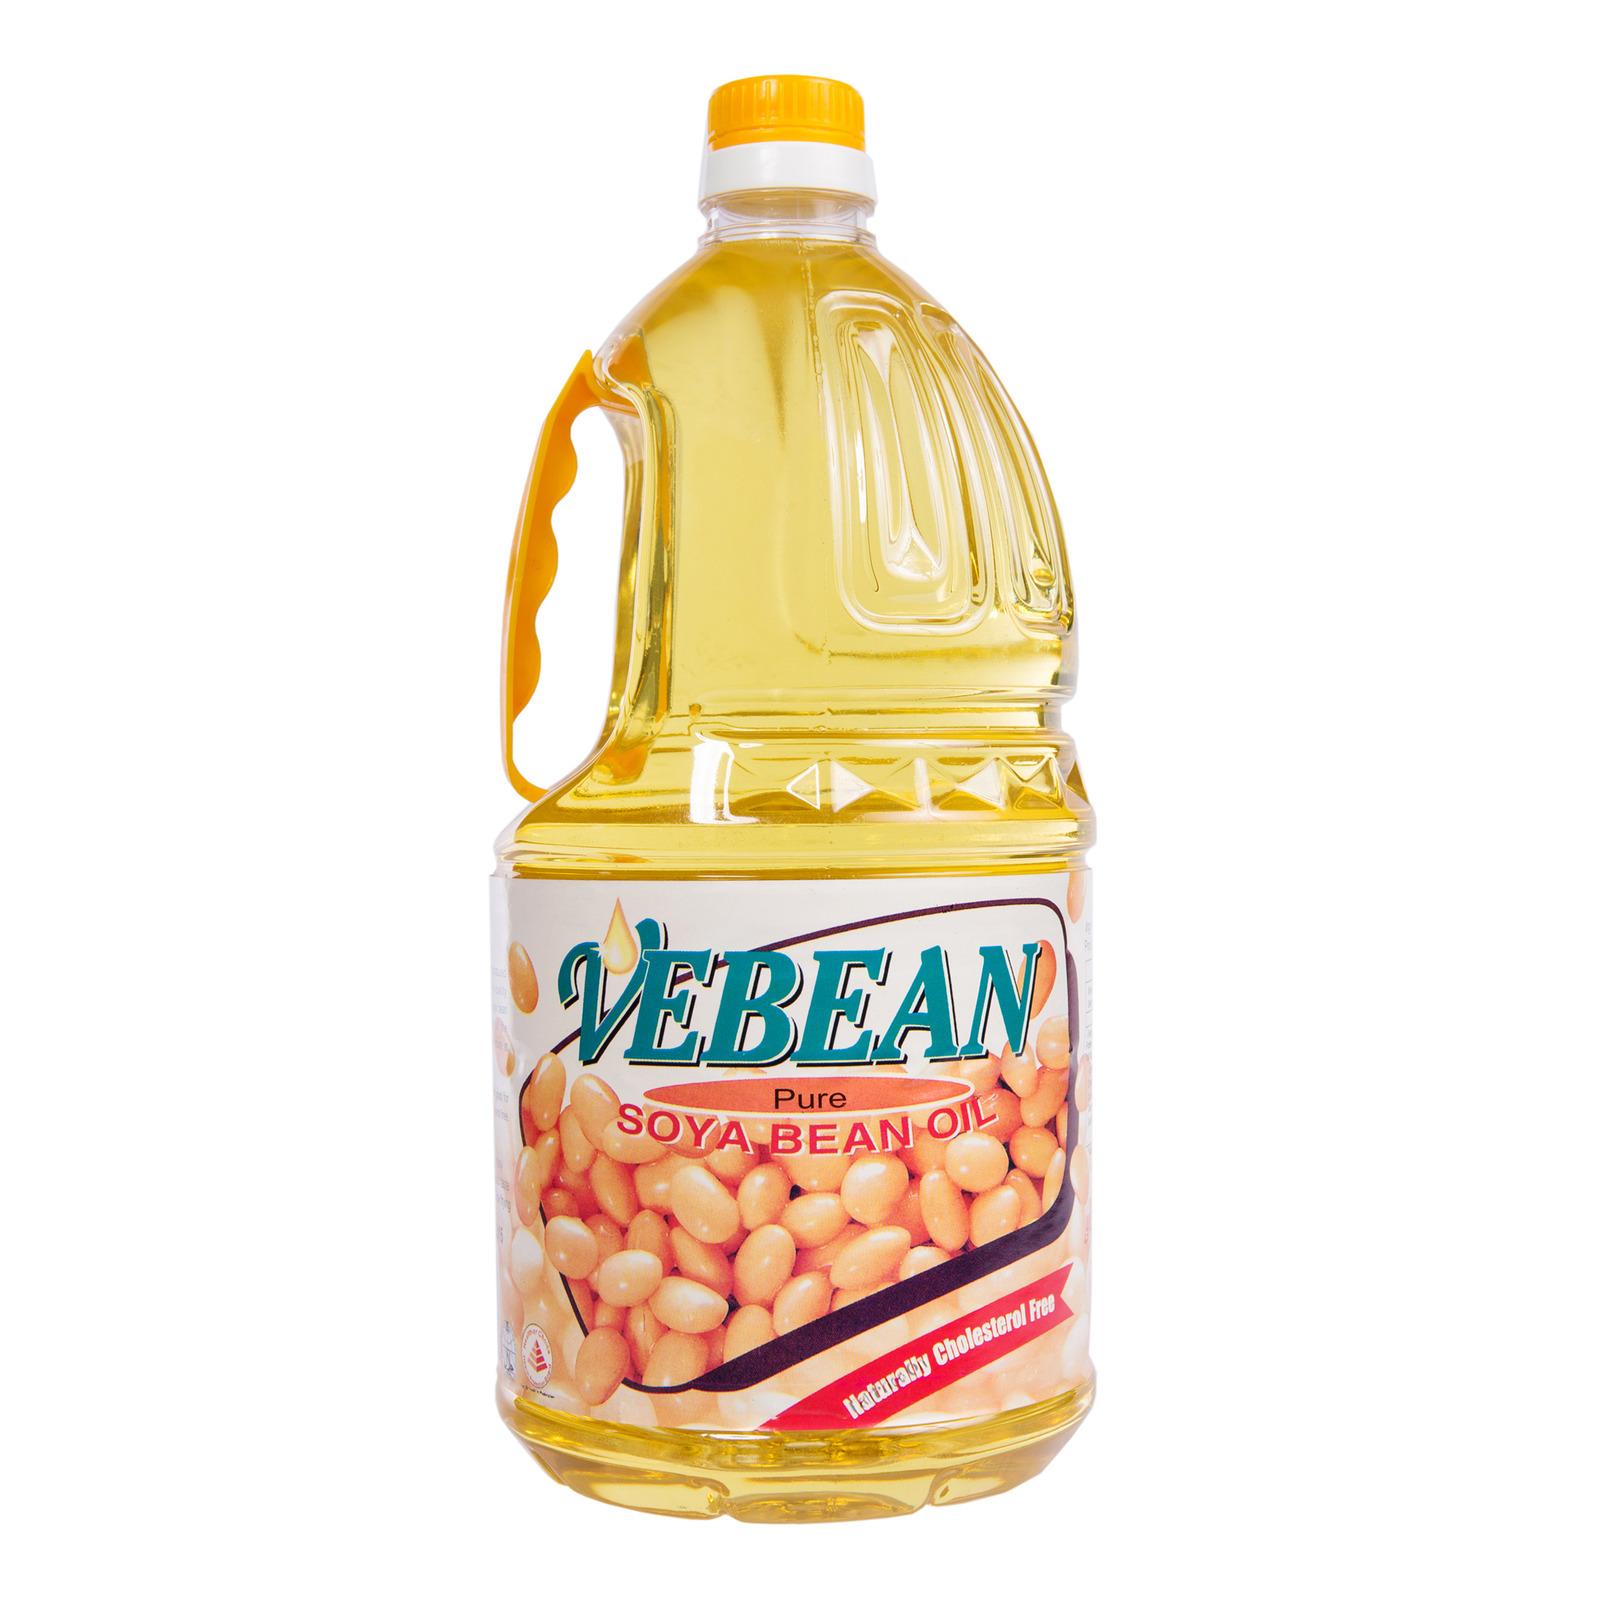 Vebean Soya Bean Oil - Pure